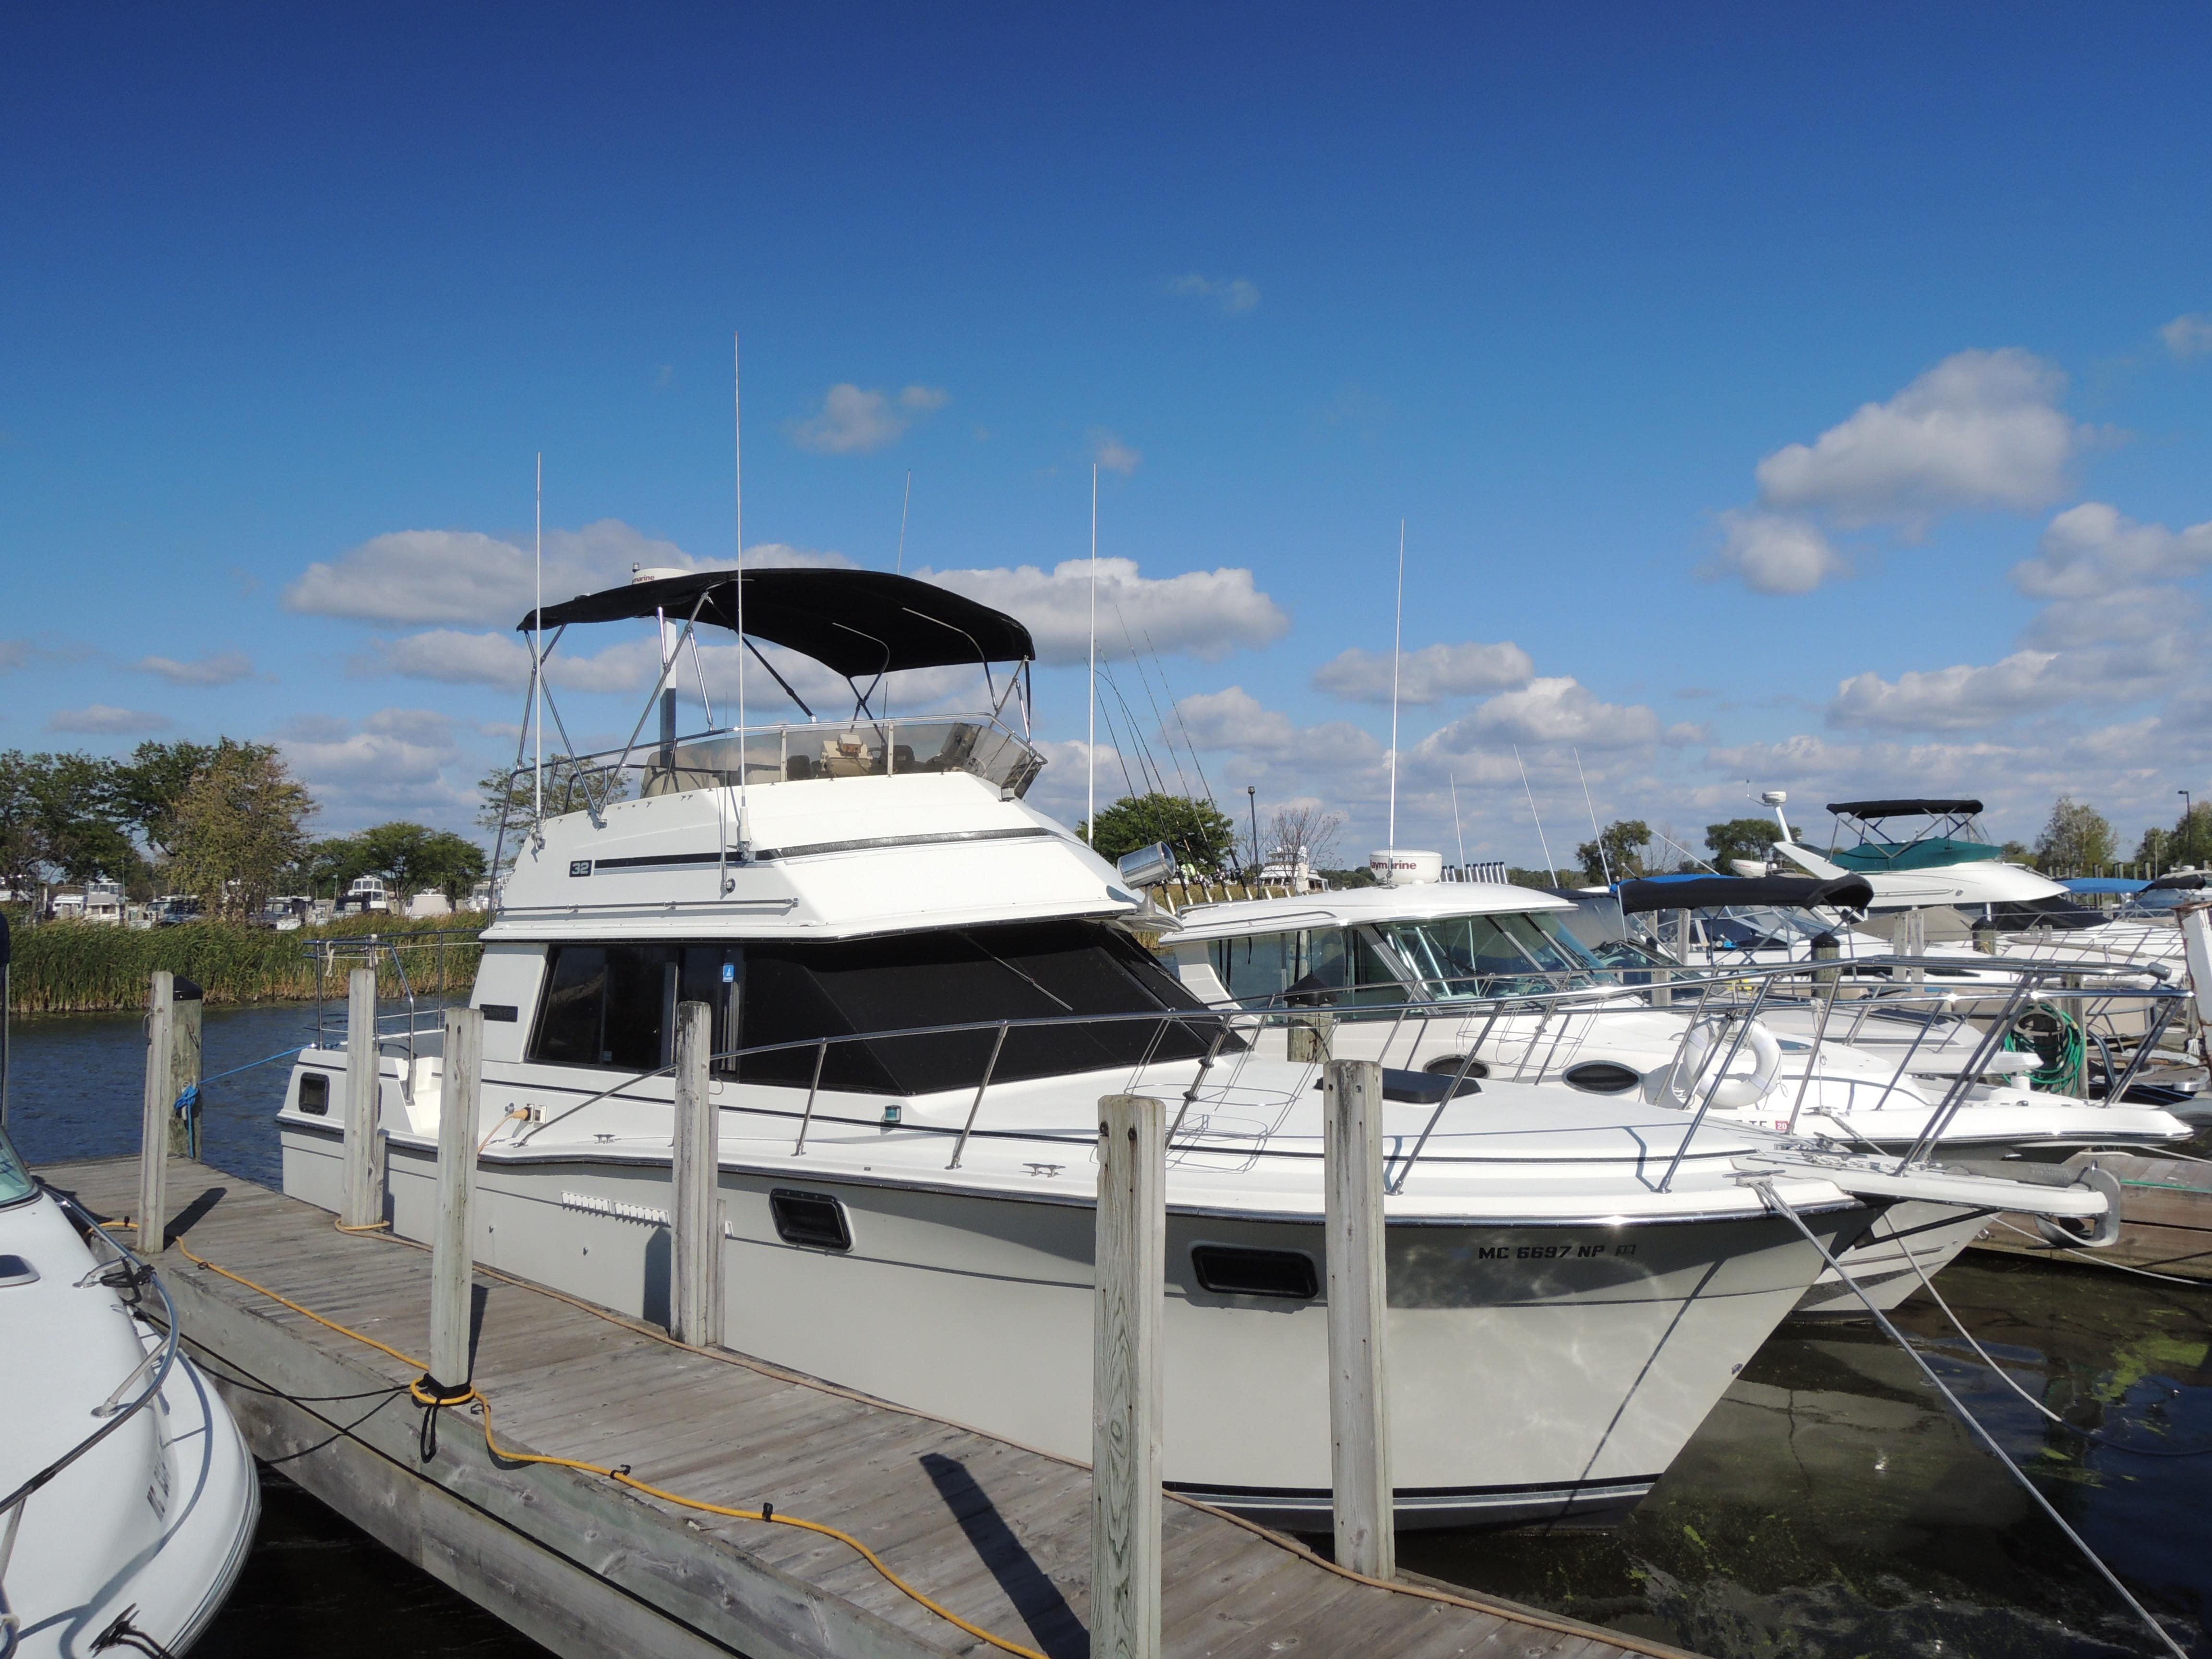 1984 Carver 3207 Power Boat For Sale Wwwyachtworldcom